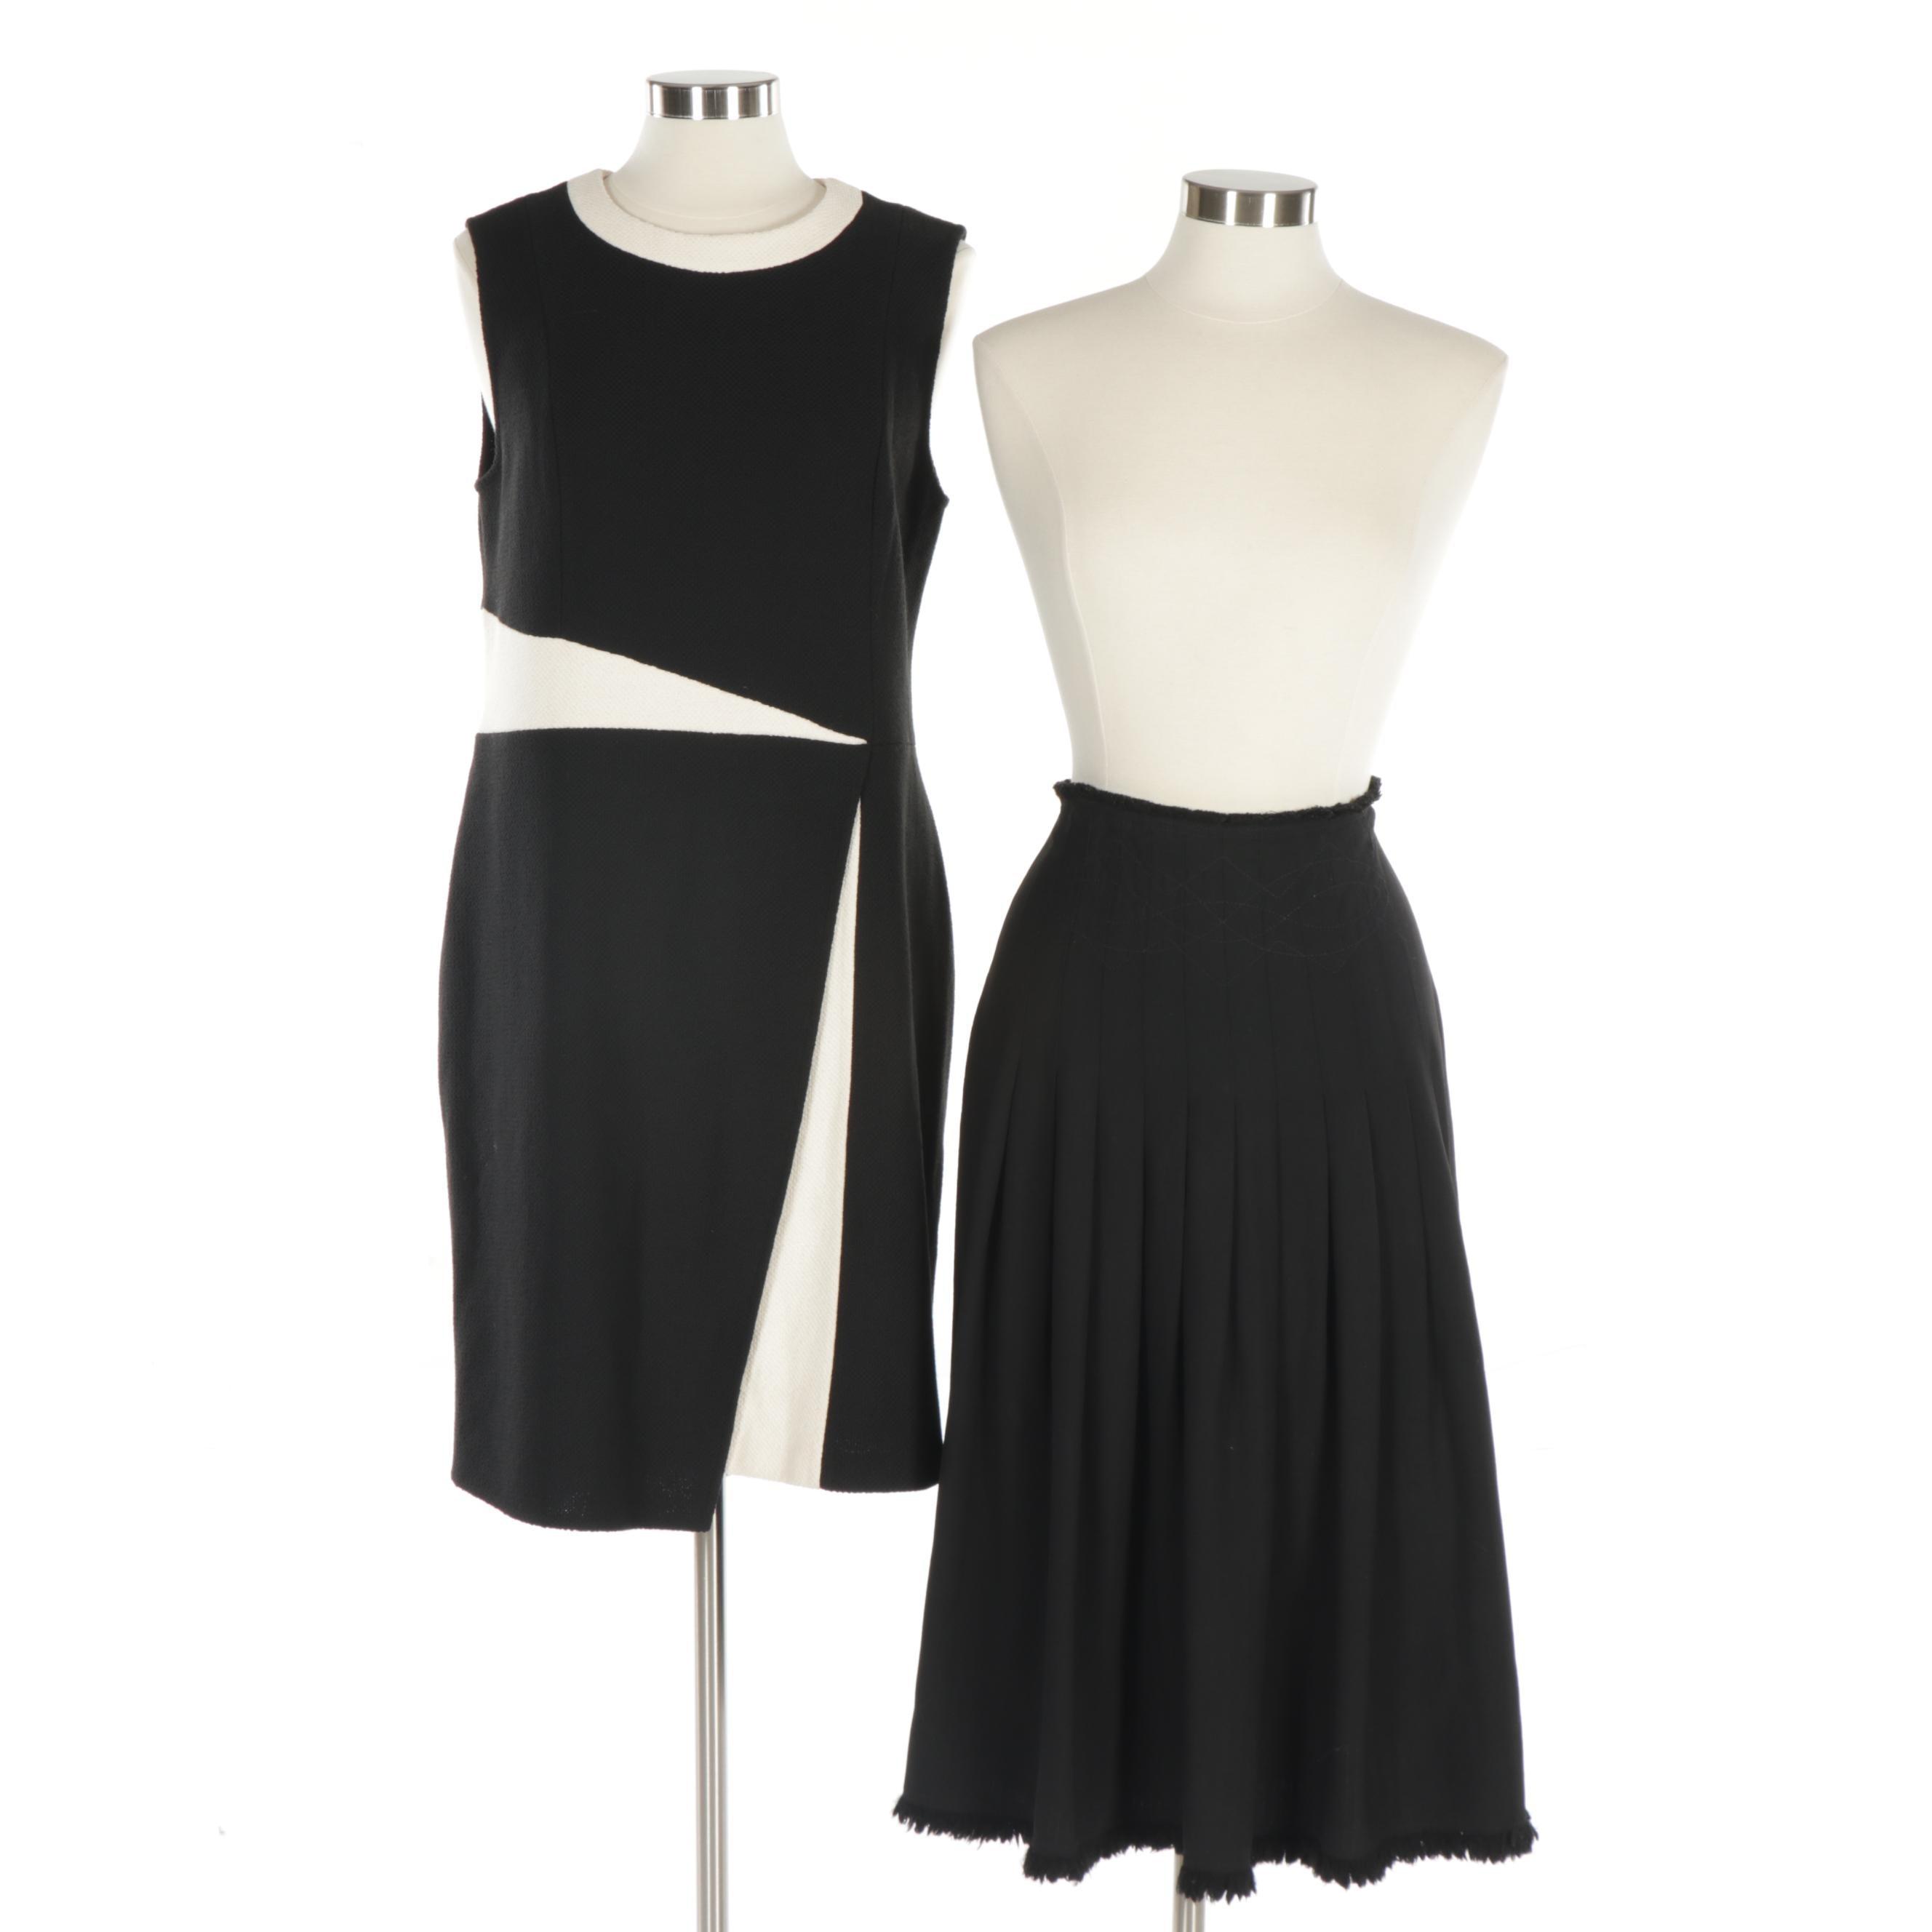 Women's St. John Sleeveless Knit Dress and Max Mara Weekend Black Pleated Skirt